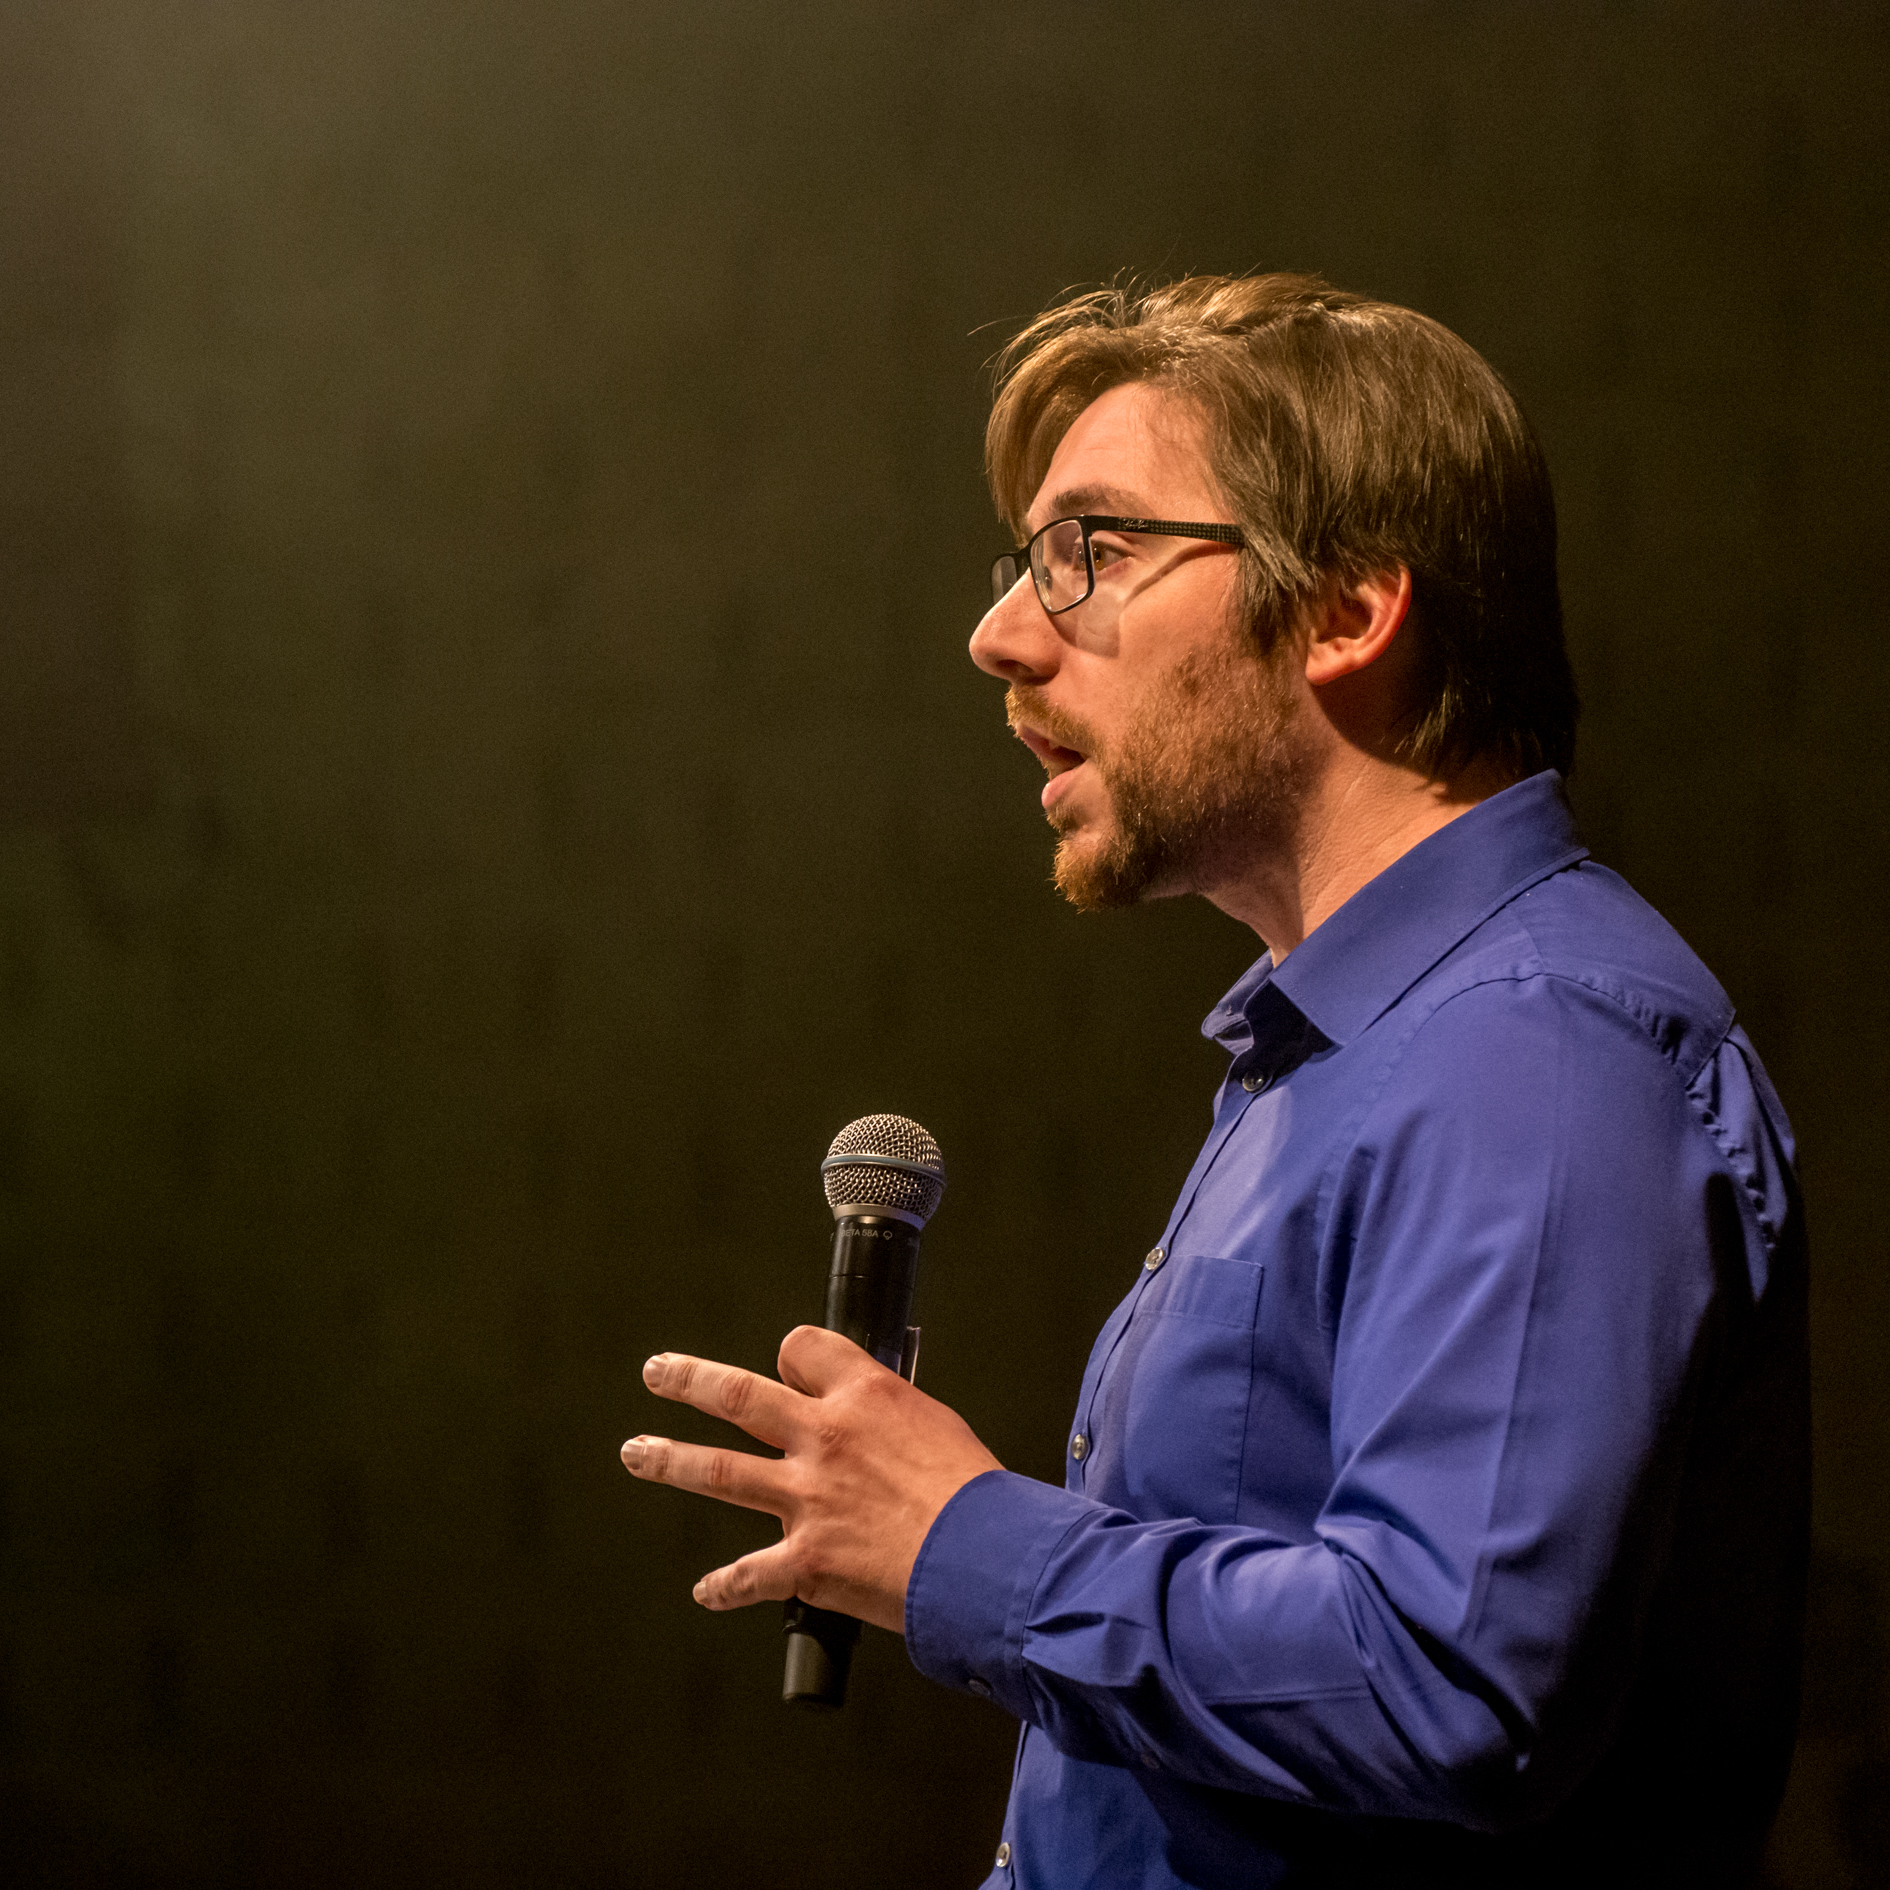 Presentatie Jan-Bart De Muelenaere